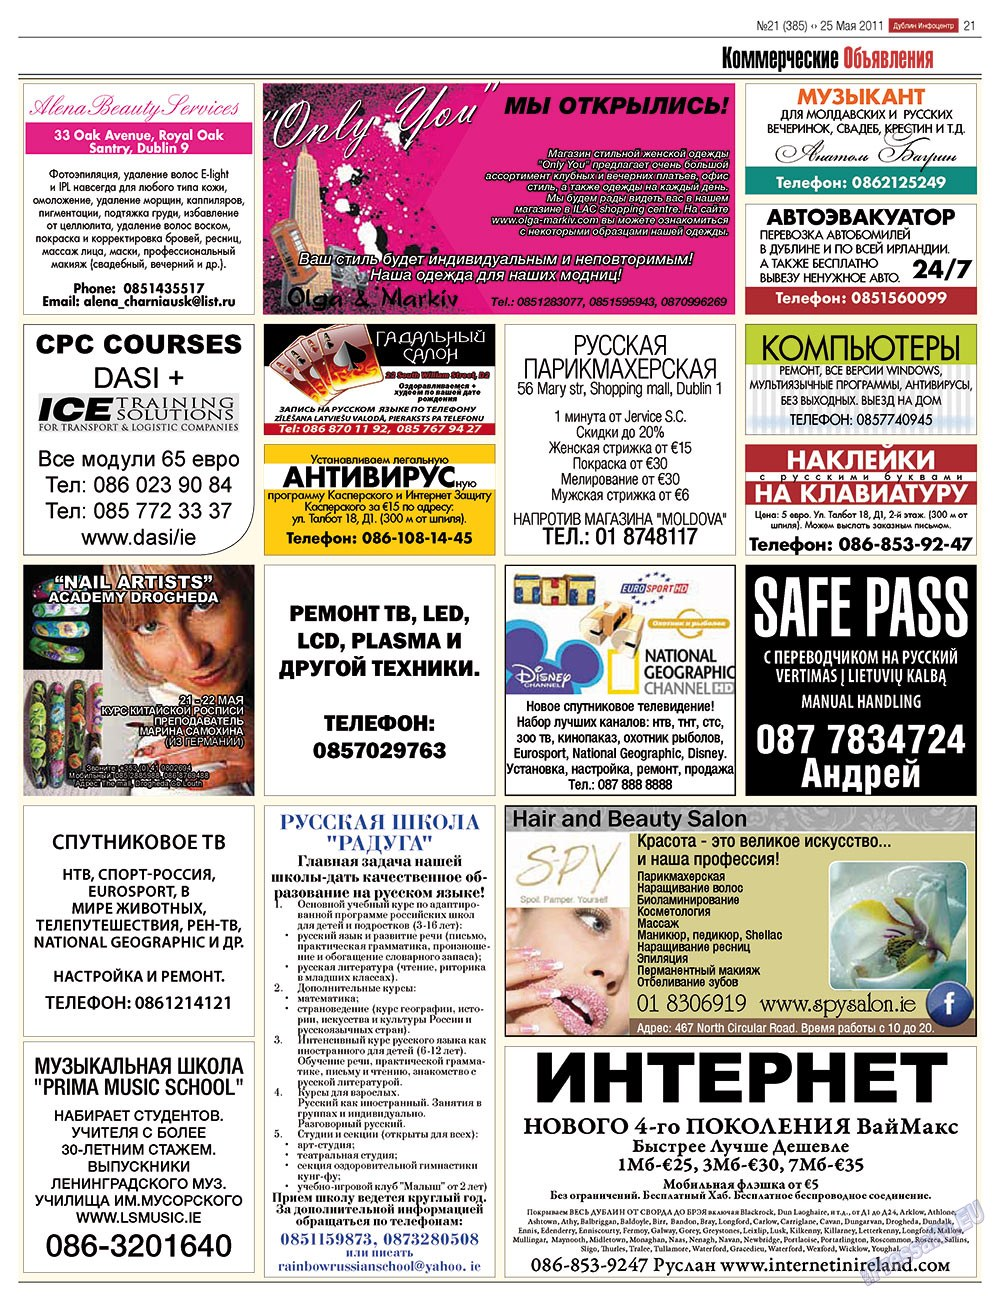 Дублин инфоцентр (газета). 2011 год, номер 21, стр. 21